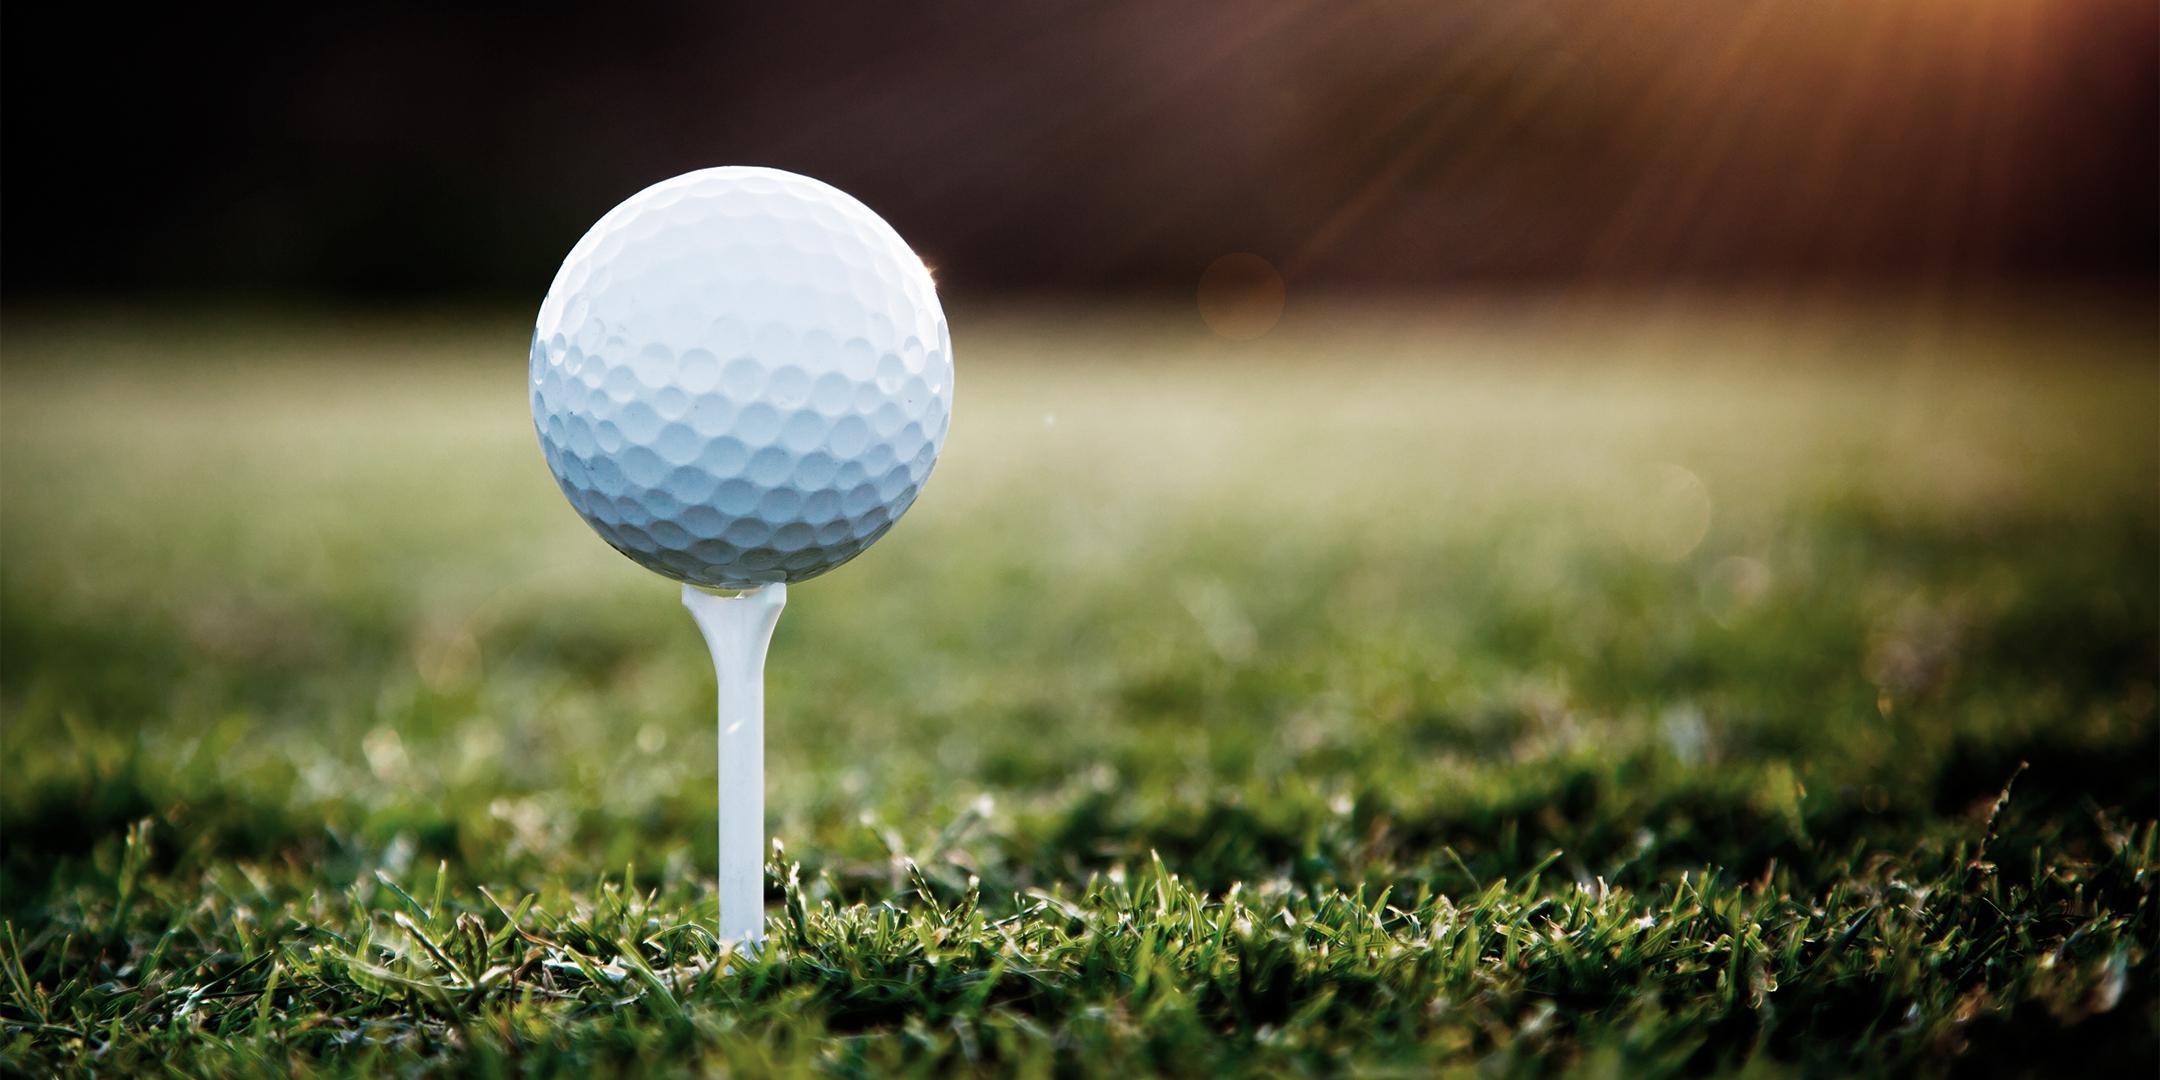 2019 IIDA RMC 6th Annual Golf Tournament